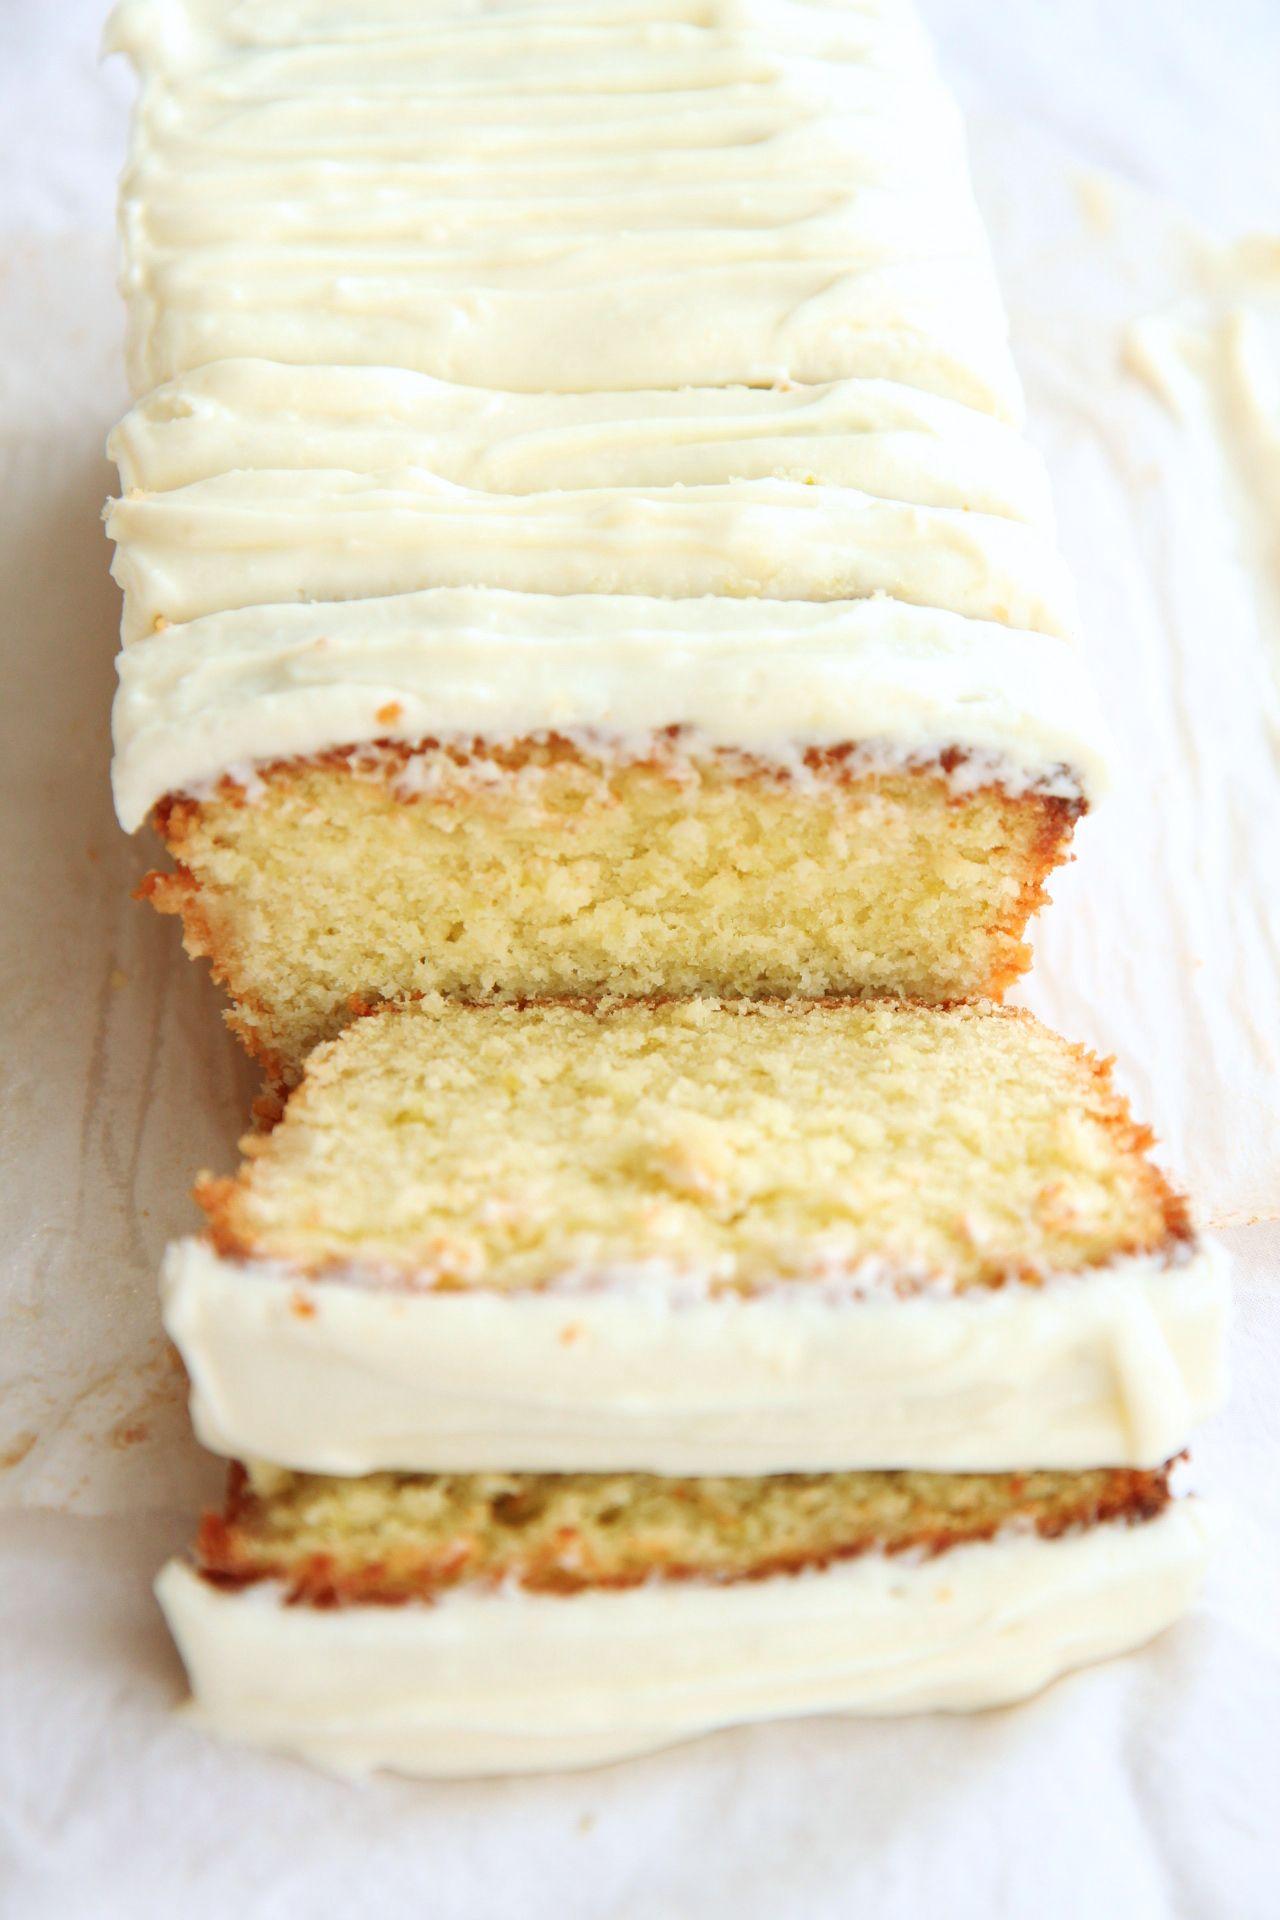 Best Coconut Cake In Dc